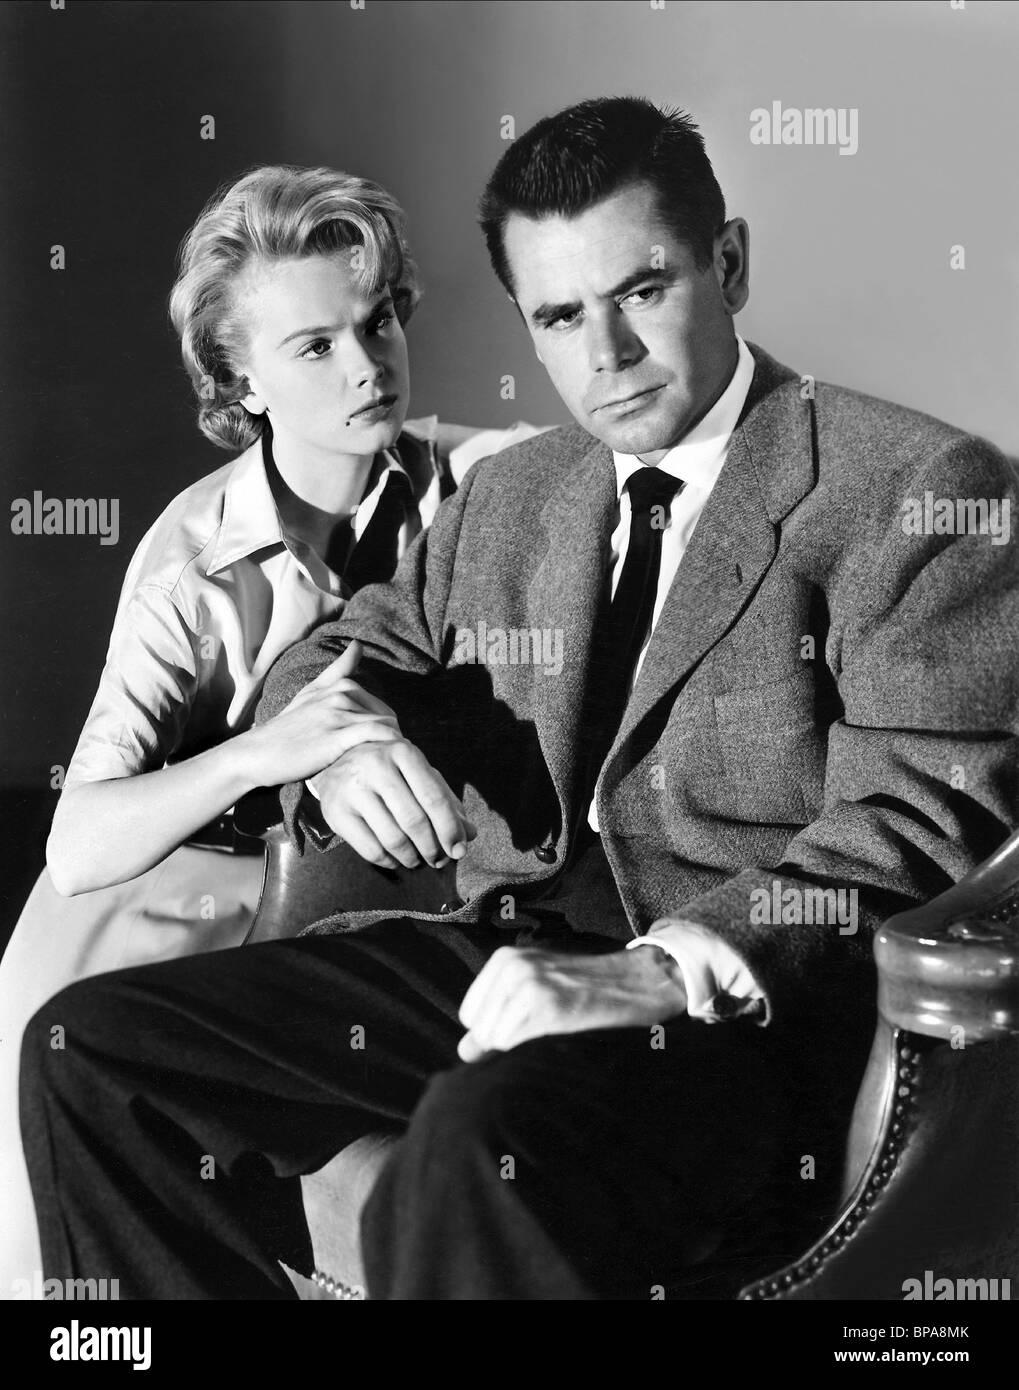 Anne francis glenn ford blackboard jungle 1955 stock image